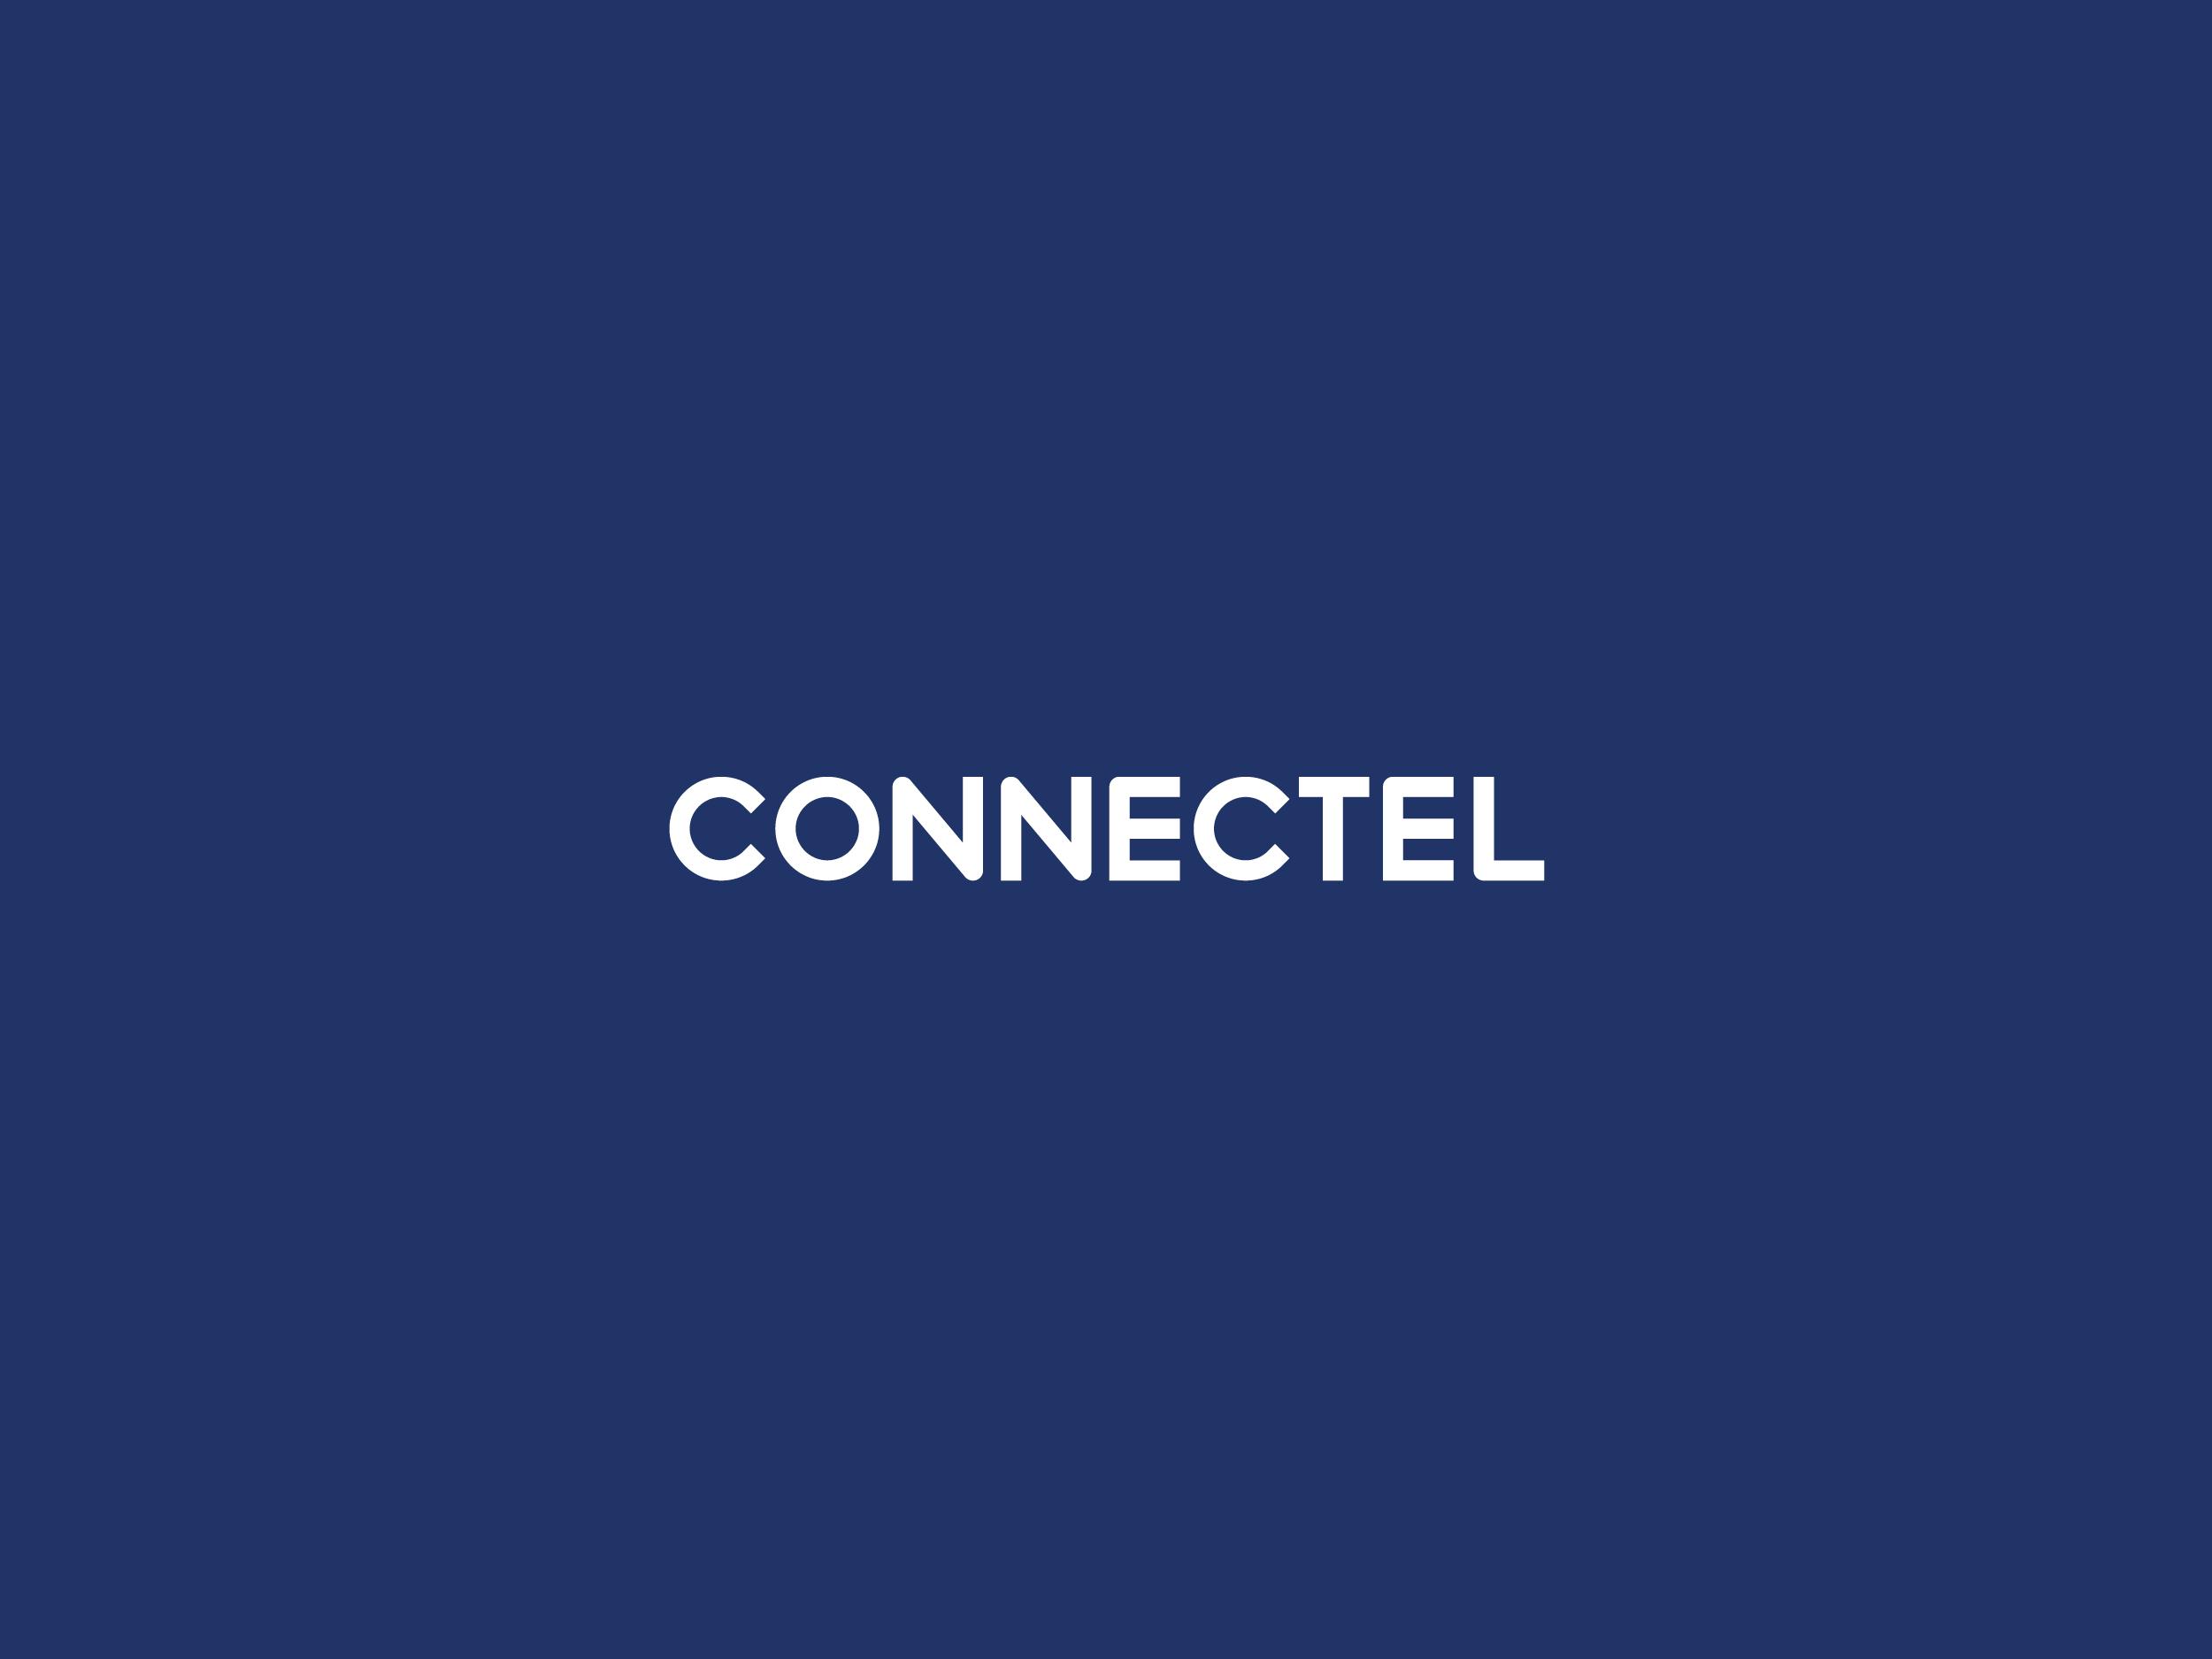 Connectel_Case11.jpg